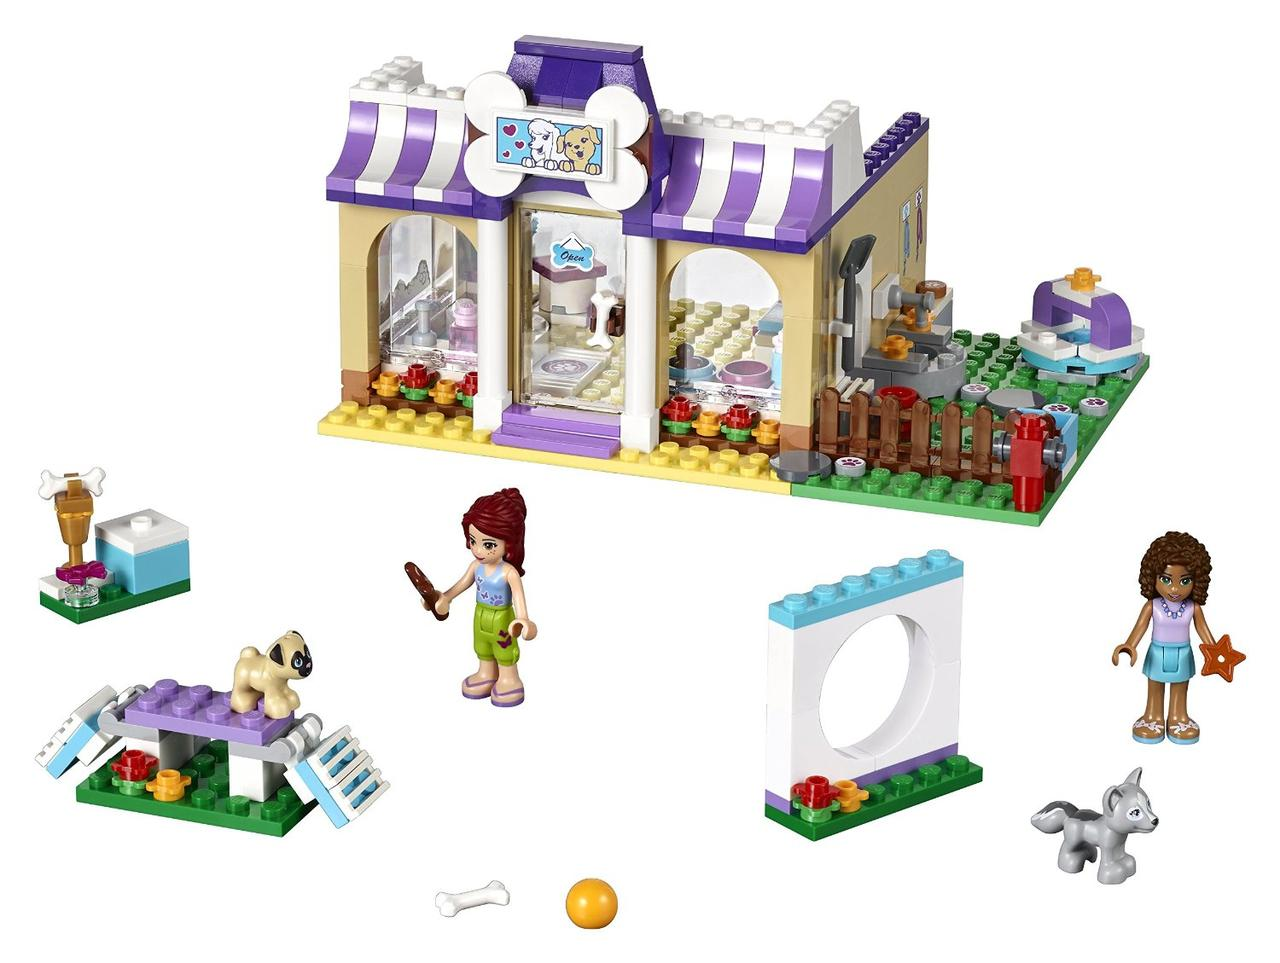 LEGO Friends Детский садик для щенков в Хартлейке Heartlake Puppy Daycare Building Kit 41124